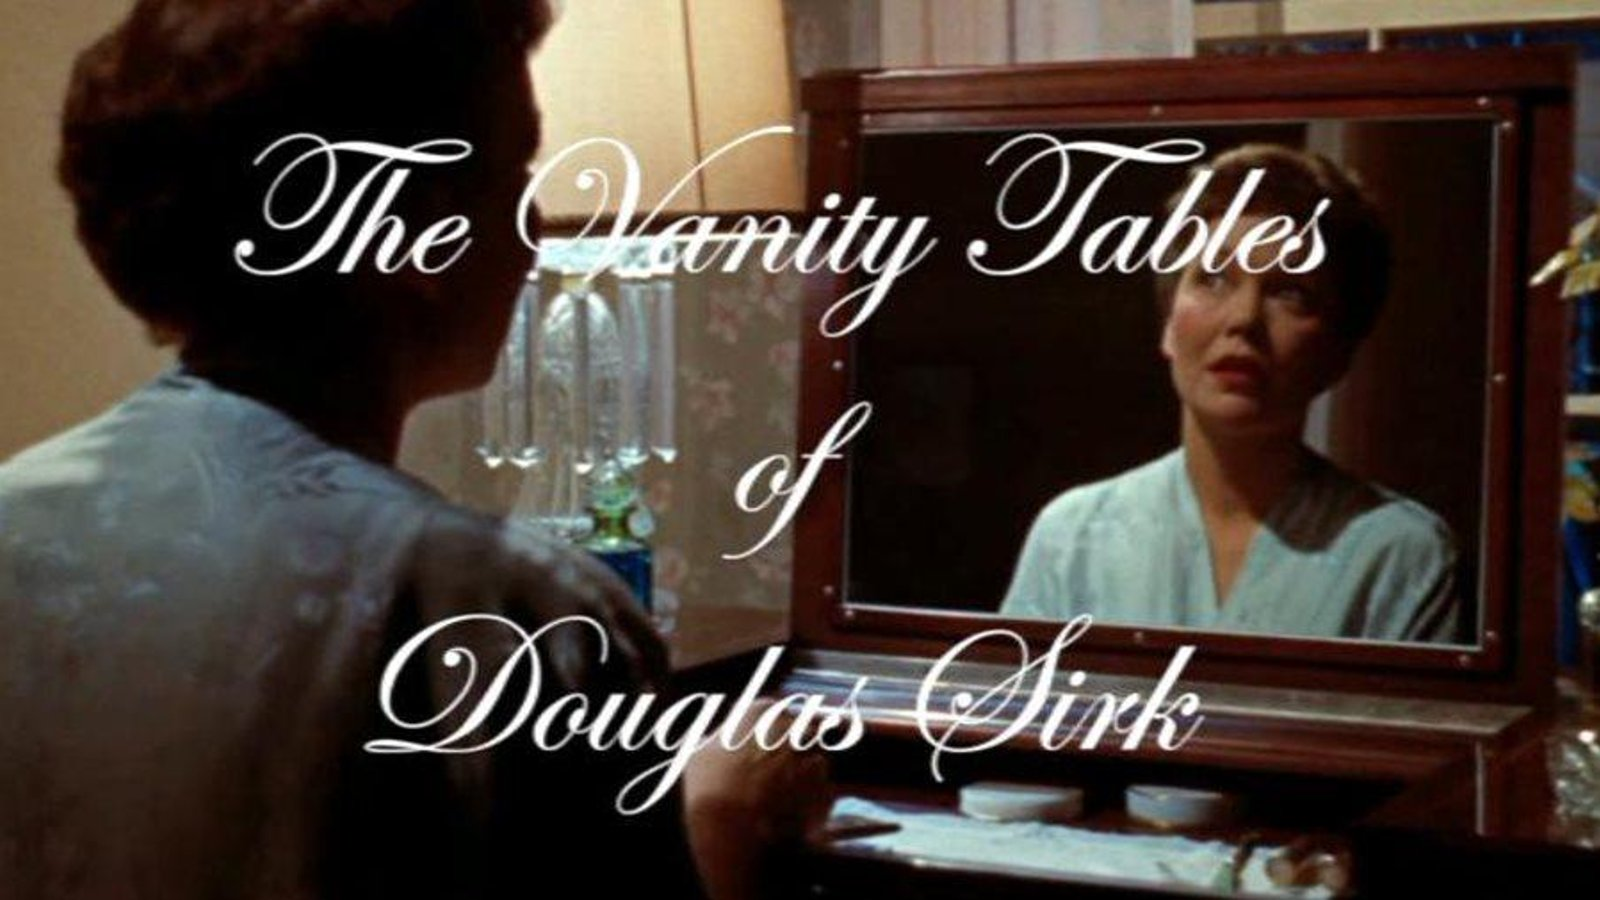 The Vanity Tables of Douglas Sirk - A Video Essay Exploring Gender in the Films of Douglas Sirk